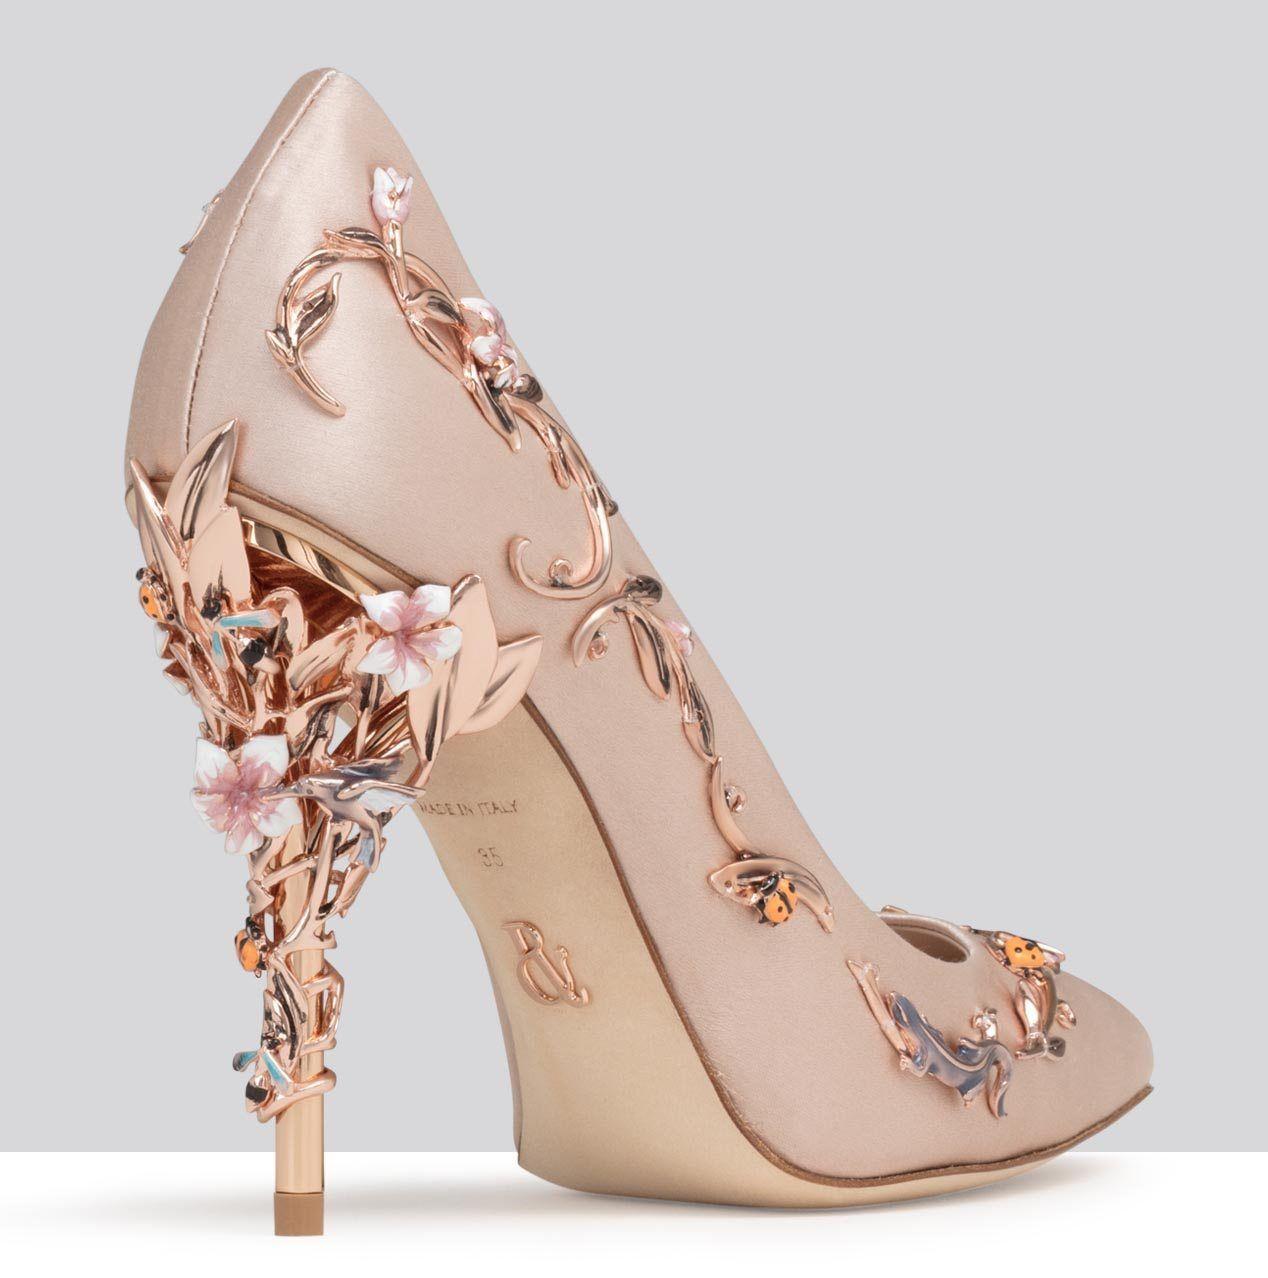 Wattpad Com User Iamrainythunder Sepatu Bertumit Sepatu Prom Sepatu Wanita